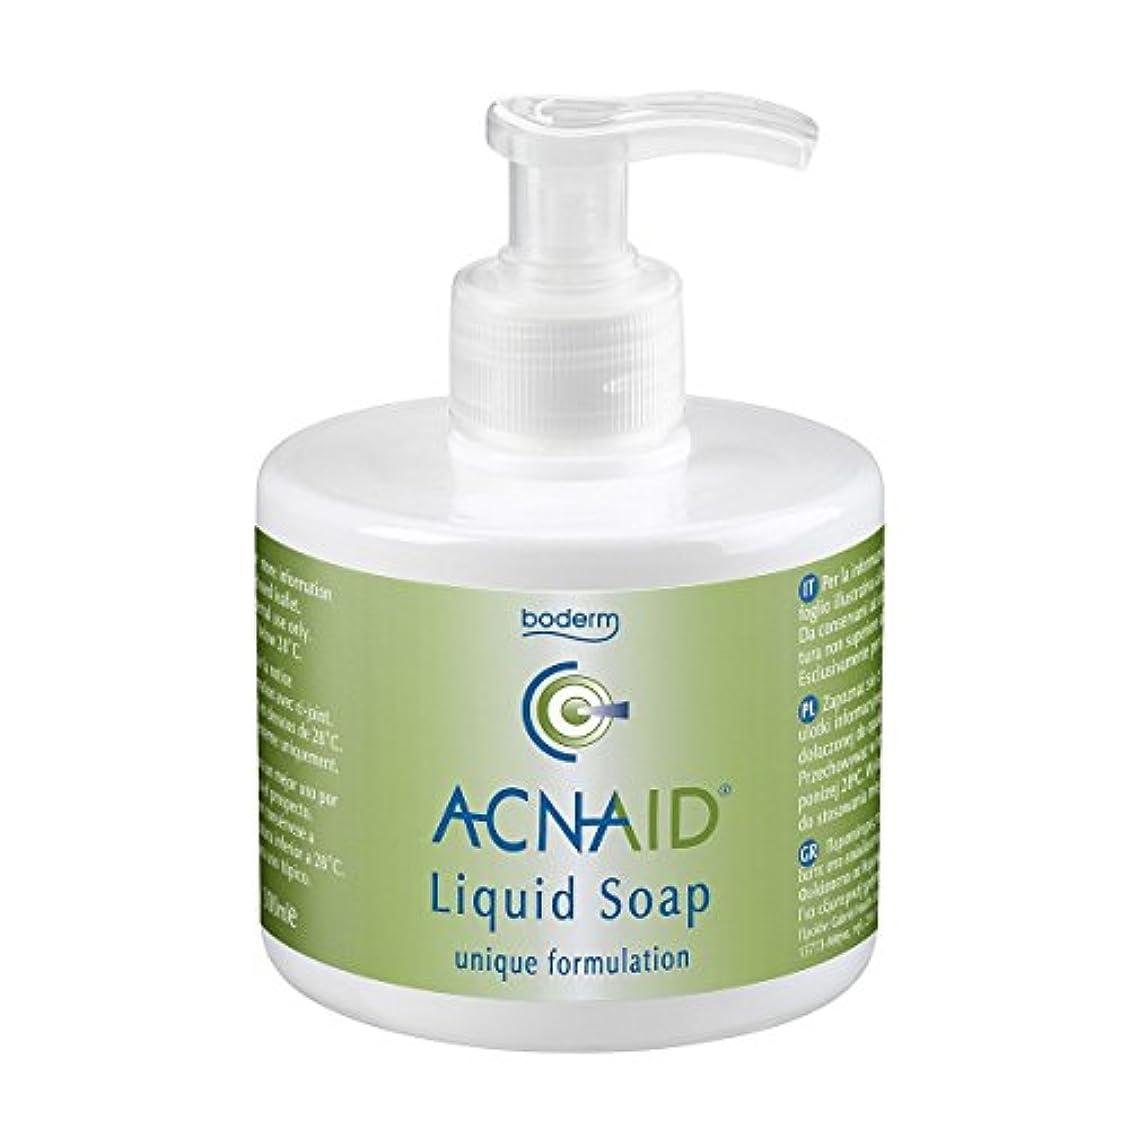 Acnaid Liquid Soap 300ml [並行輸入品]